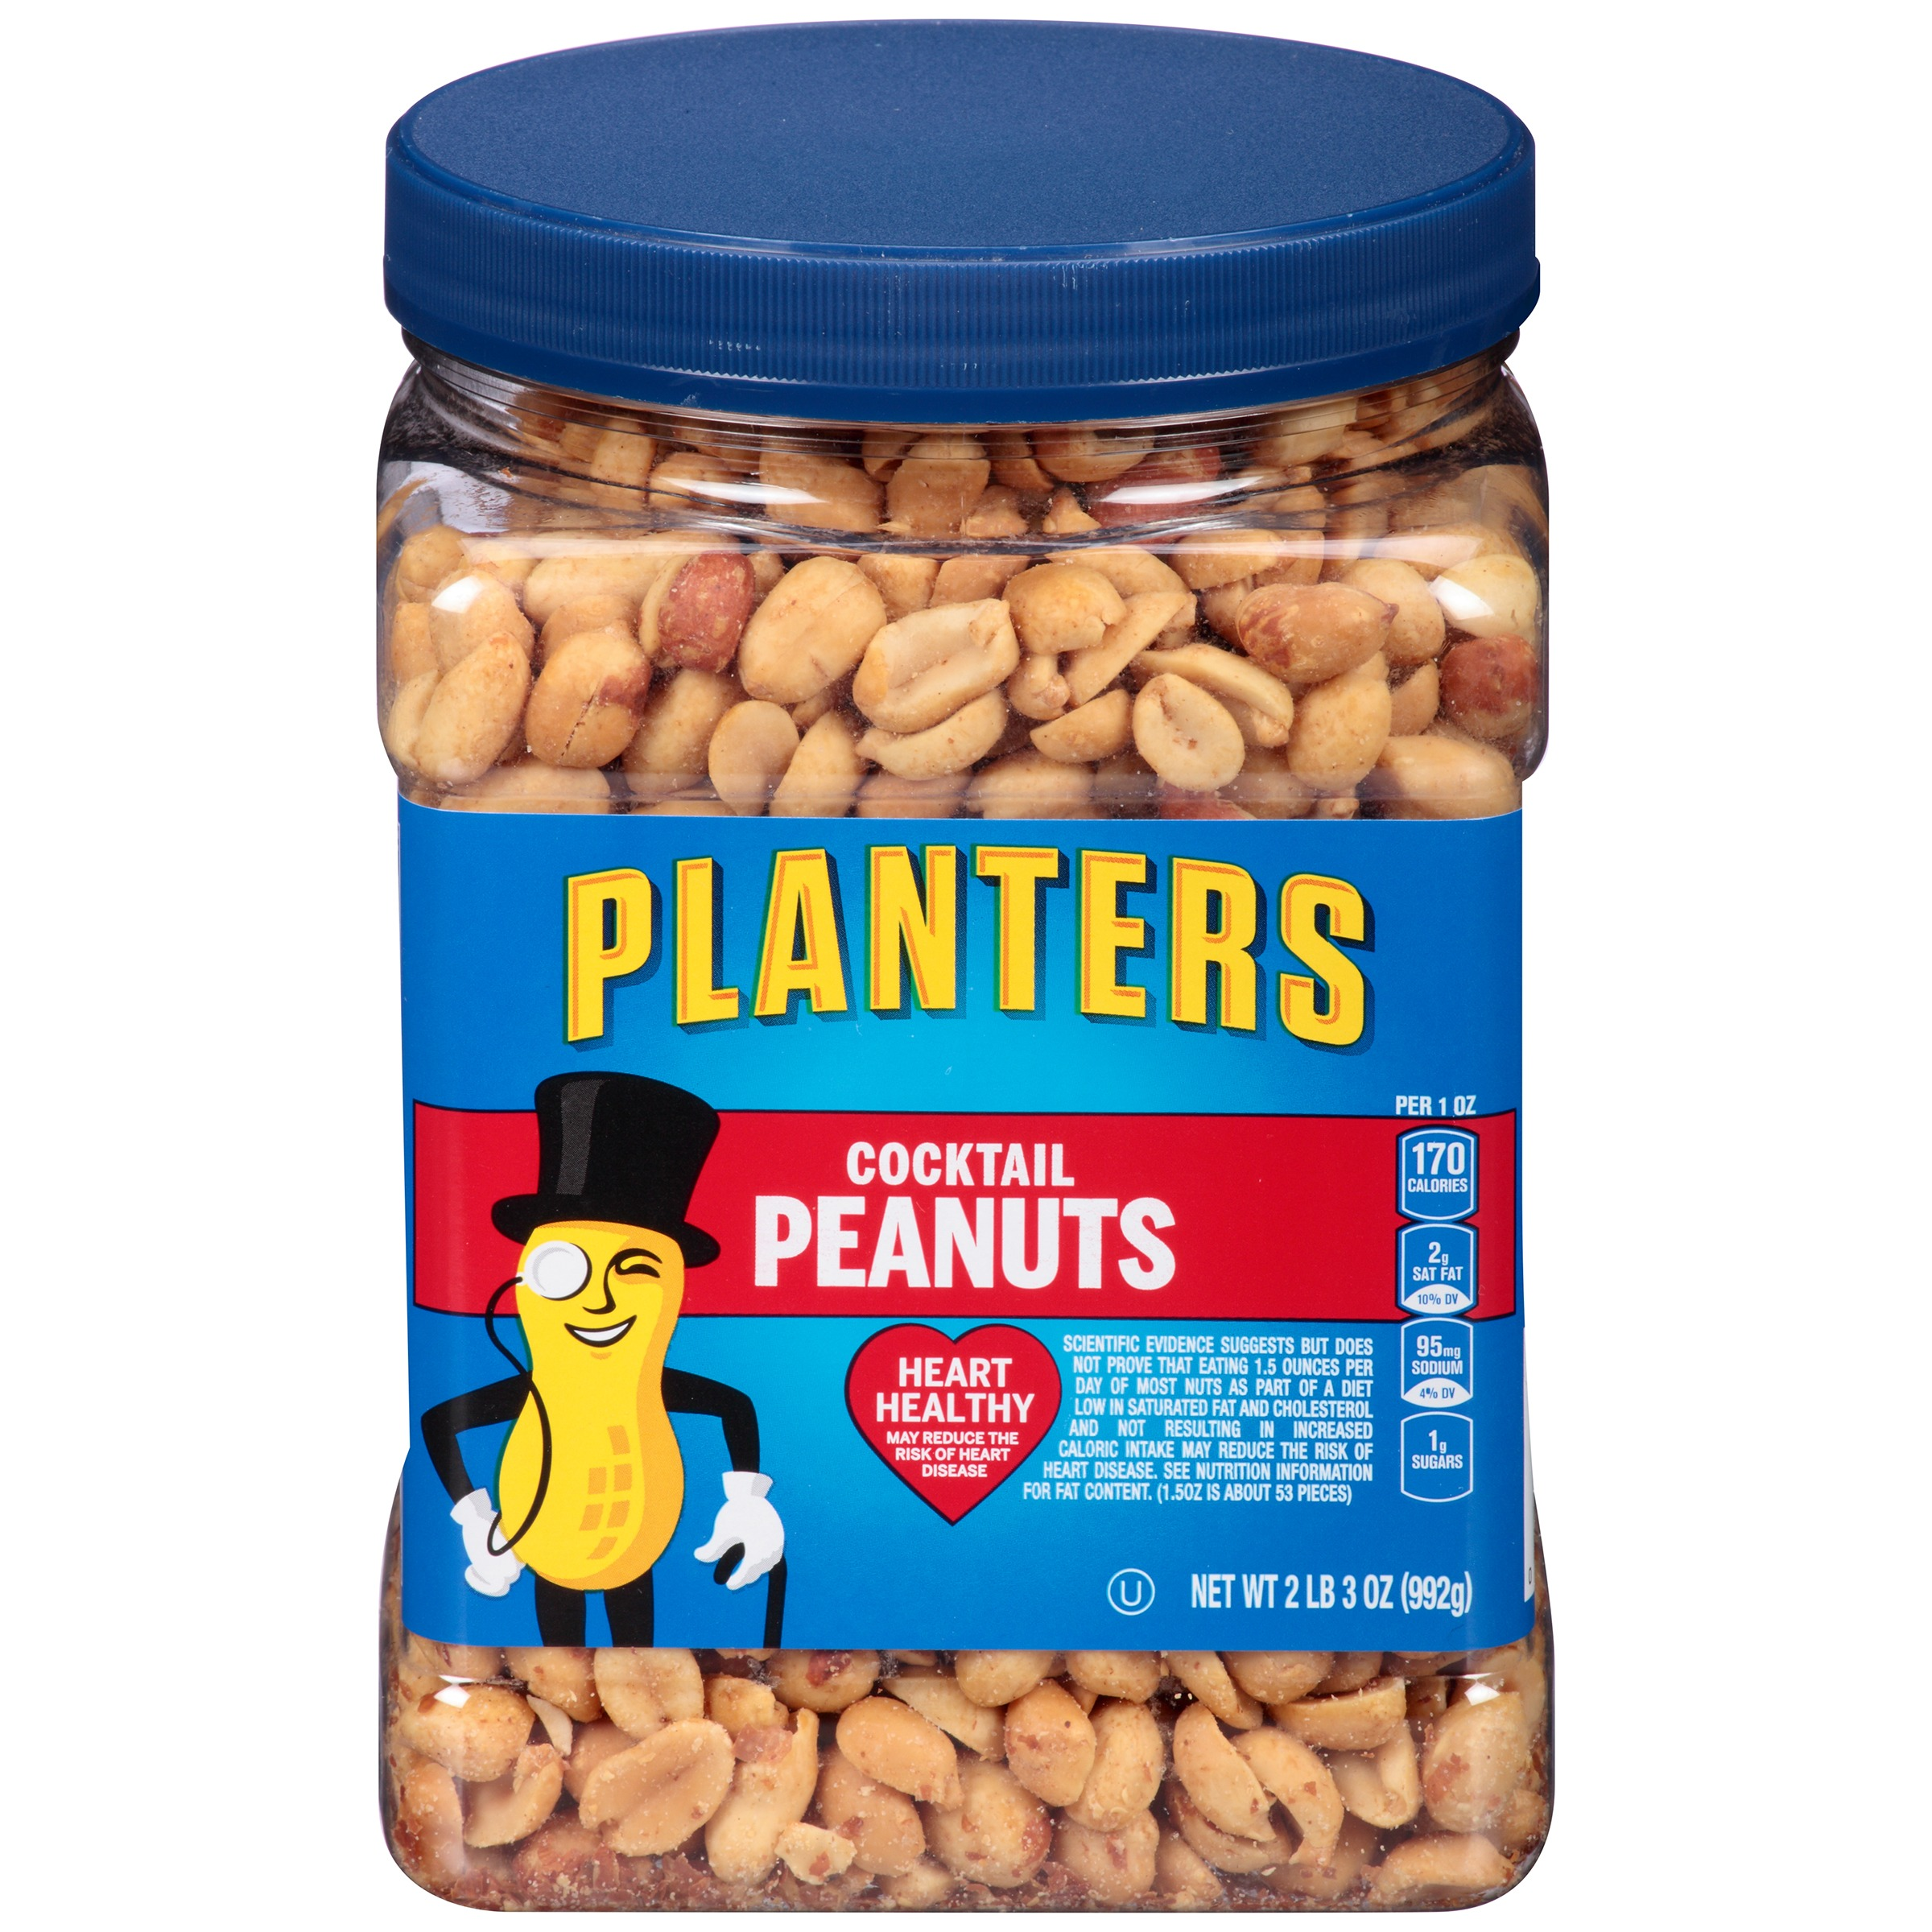 Planters Cocktail Peanuts 35 oz. Jar